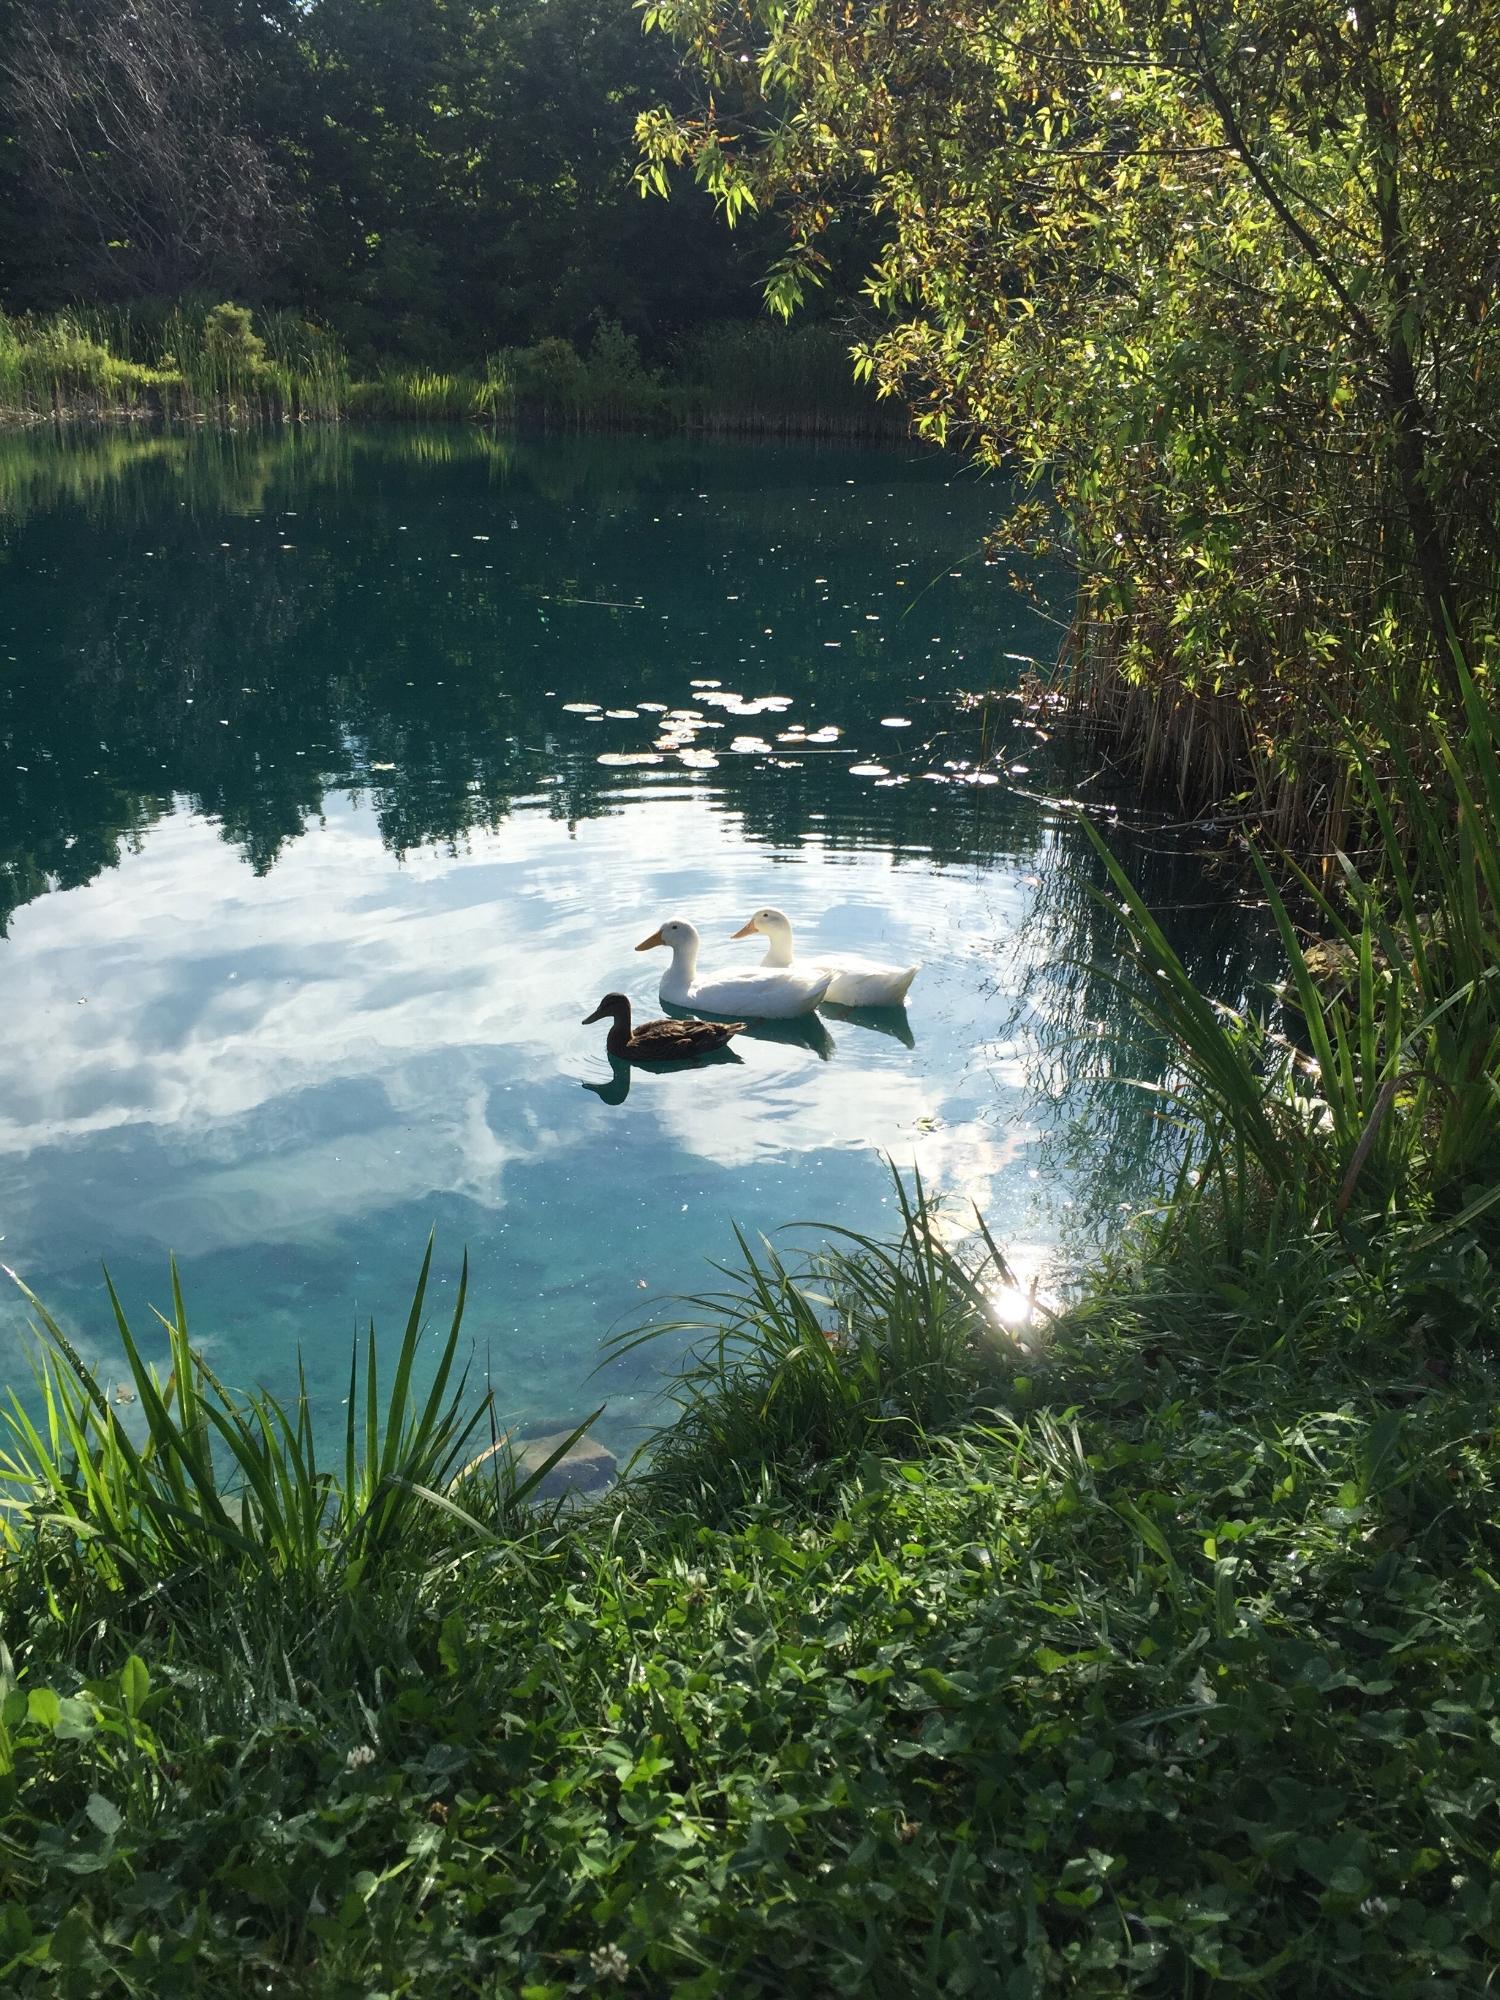 Some ducks enjoying a summer splash on the irrigation pond